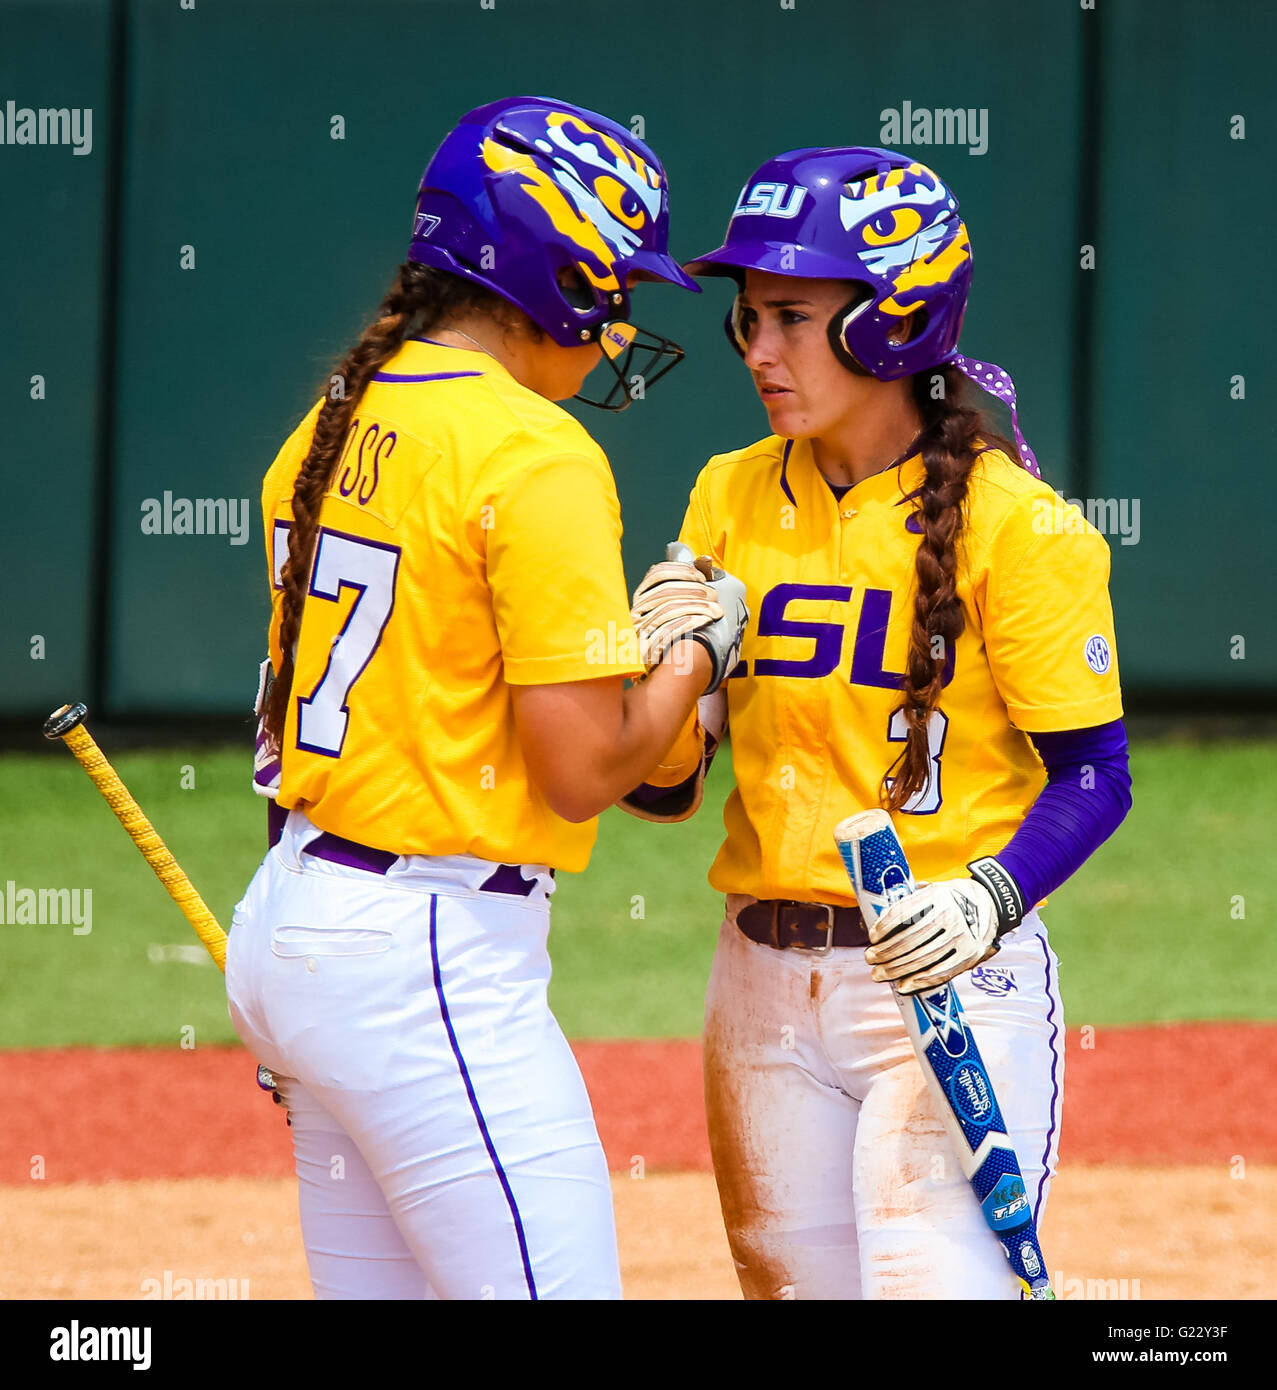 Baton Rouge, LA, USA. 22nd May, 2016. LSU Tigers infielder Sandra Simmons (3) tells LSU Tigers catcher Kellsi Kloss - Stock Image